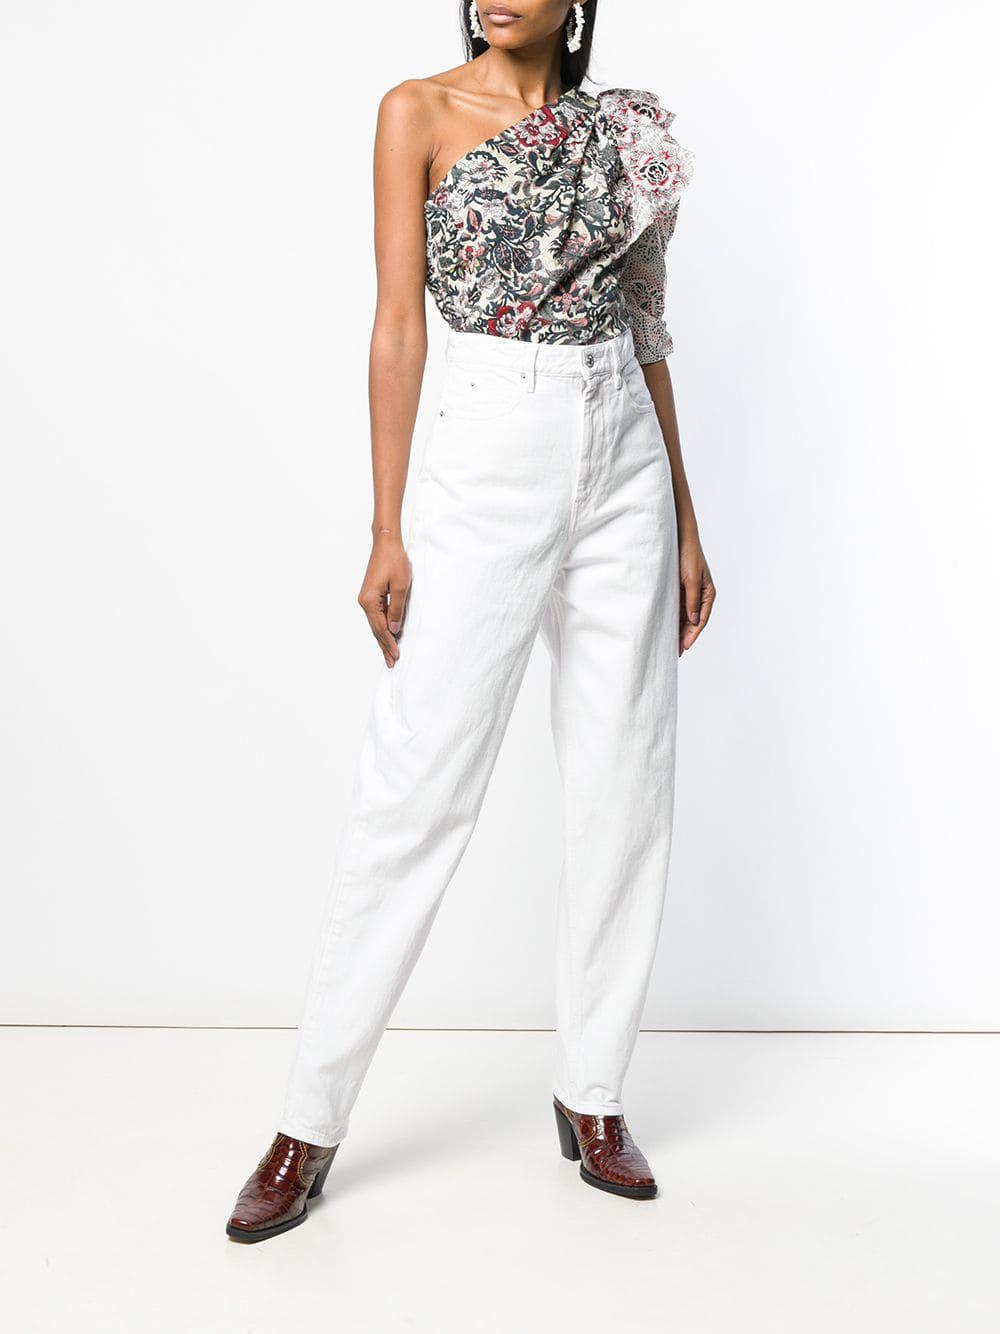 42165380304147 Lyst - Étoile Isabel Marant Floral Print One Shoulder Top in White